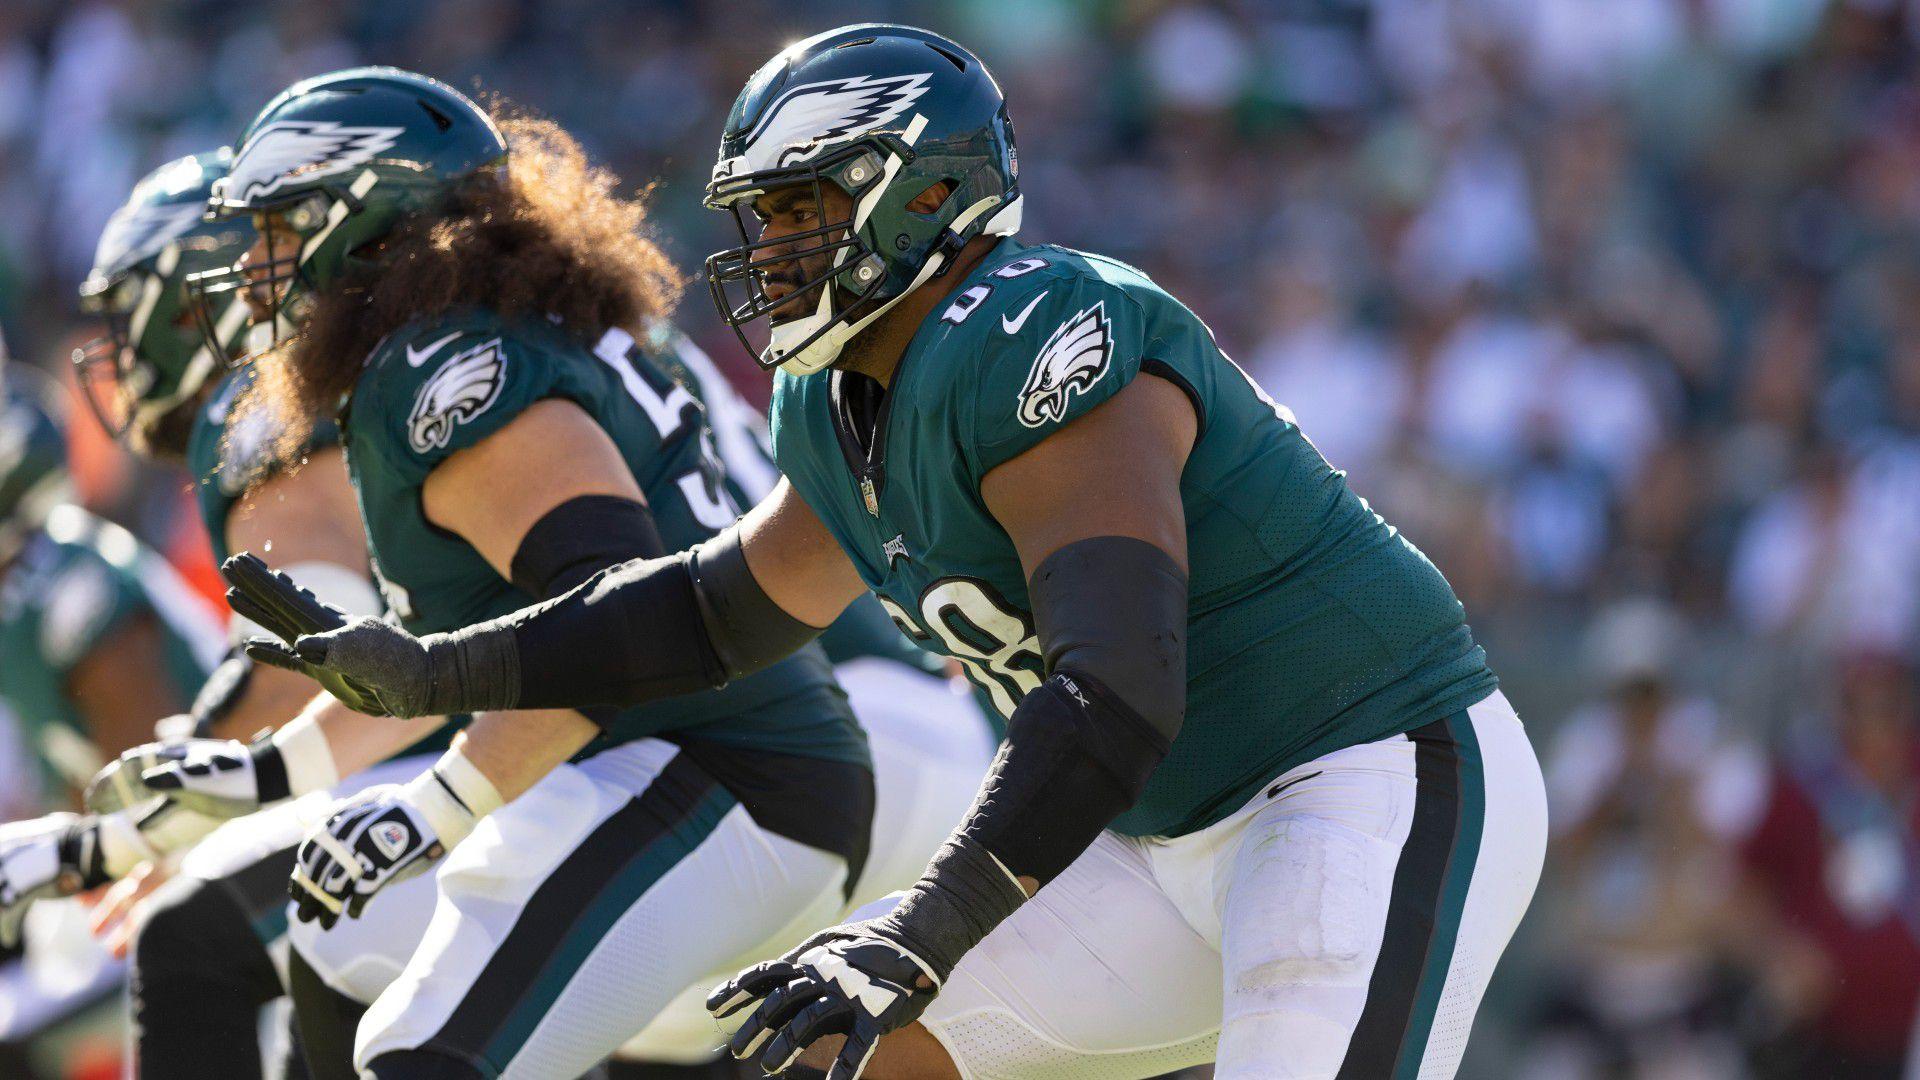 Aussie NFL star Jordan Mailata set to miss second straight game for Philadelphia Eagles